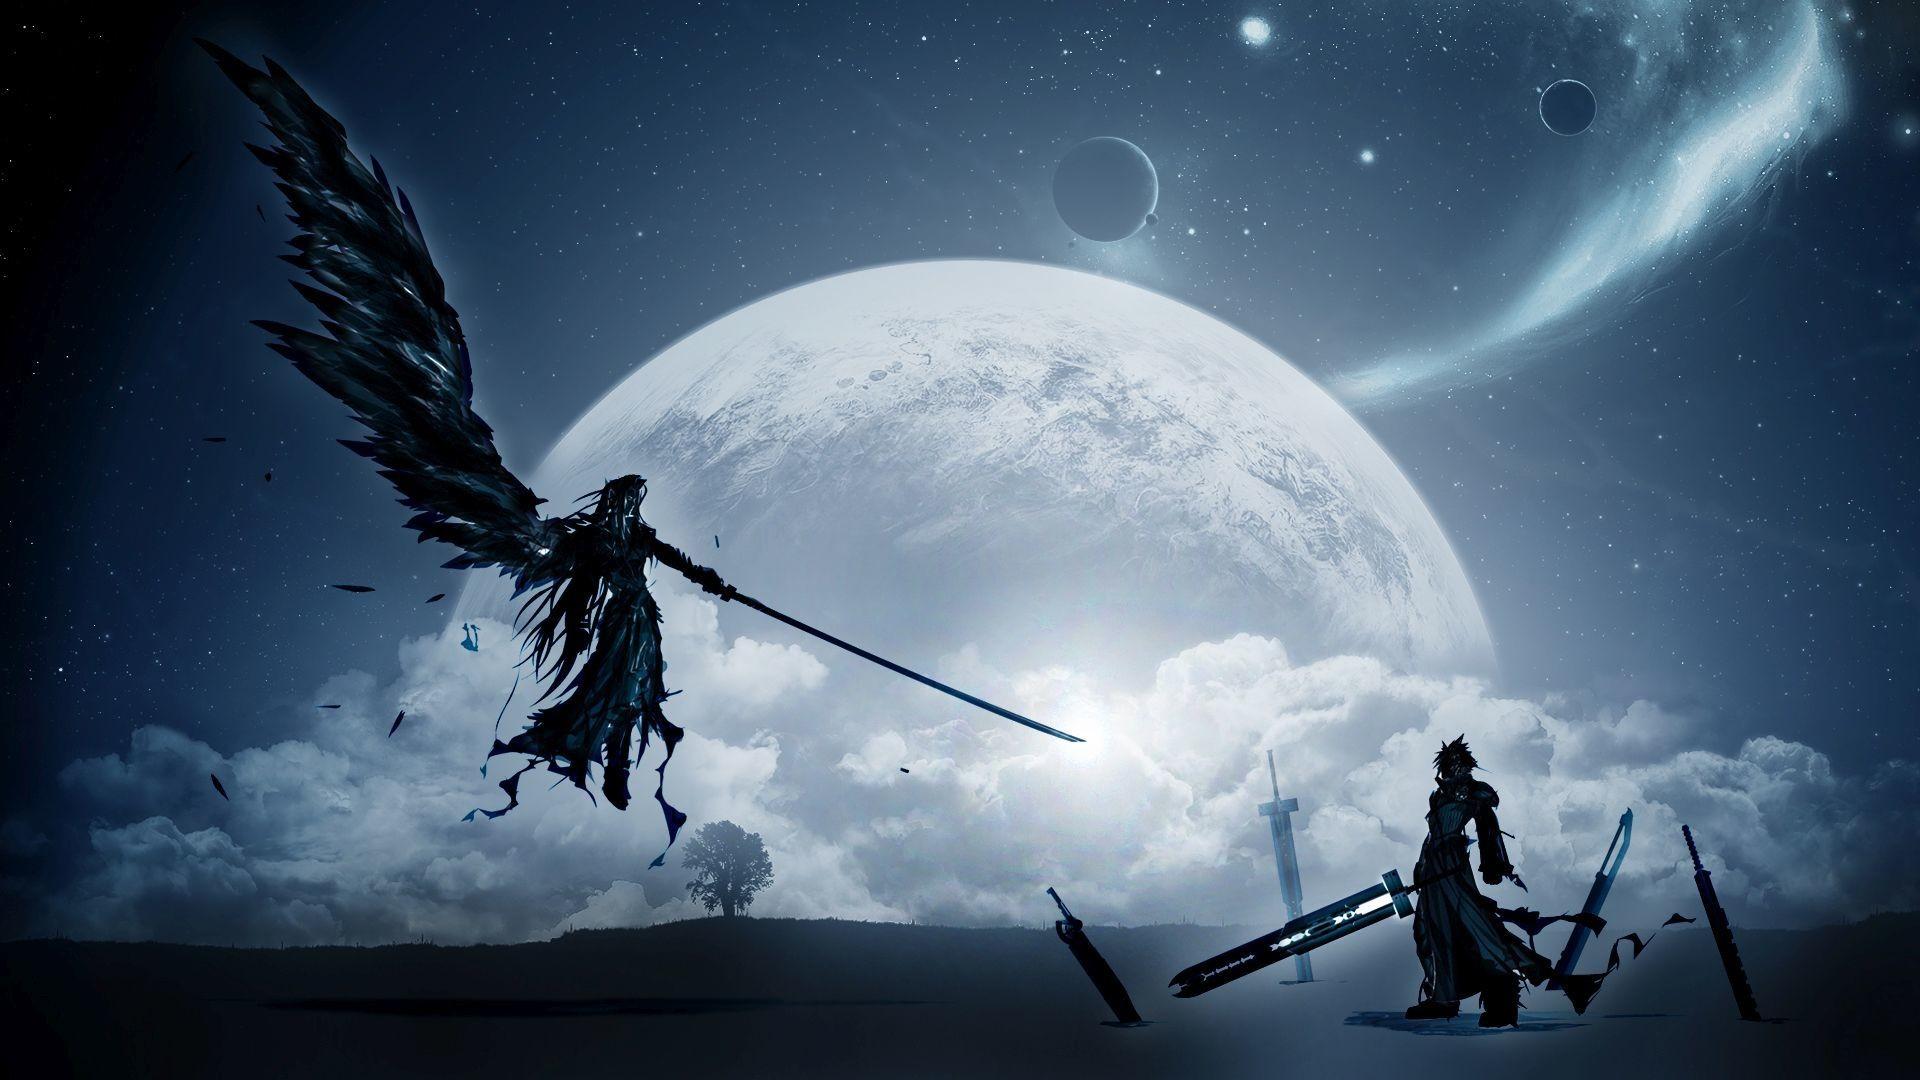 1920x1080 Wallpaperwiki Final Fantasy 7 Girl Image PIC